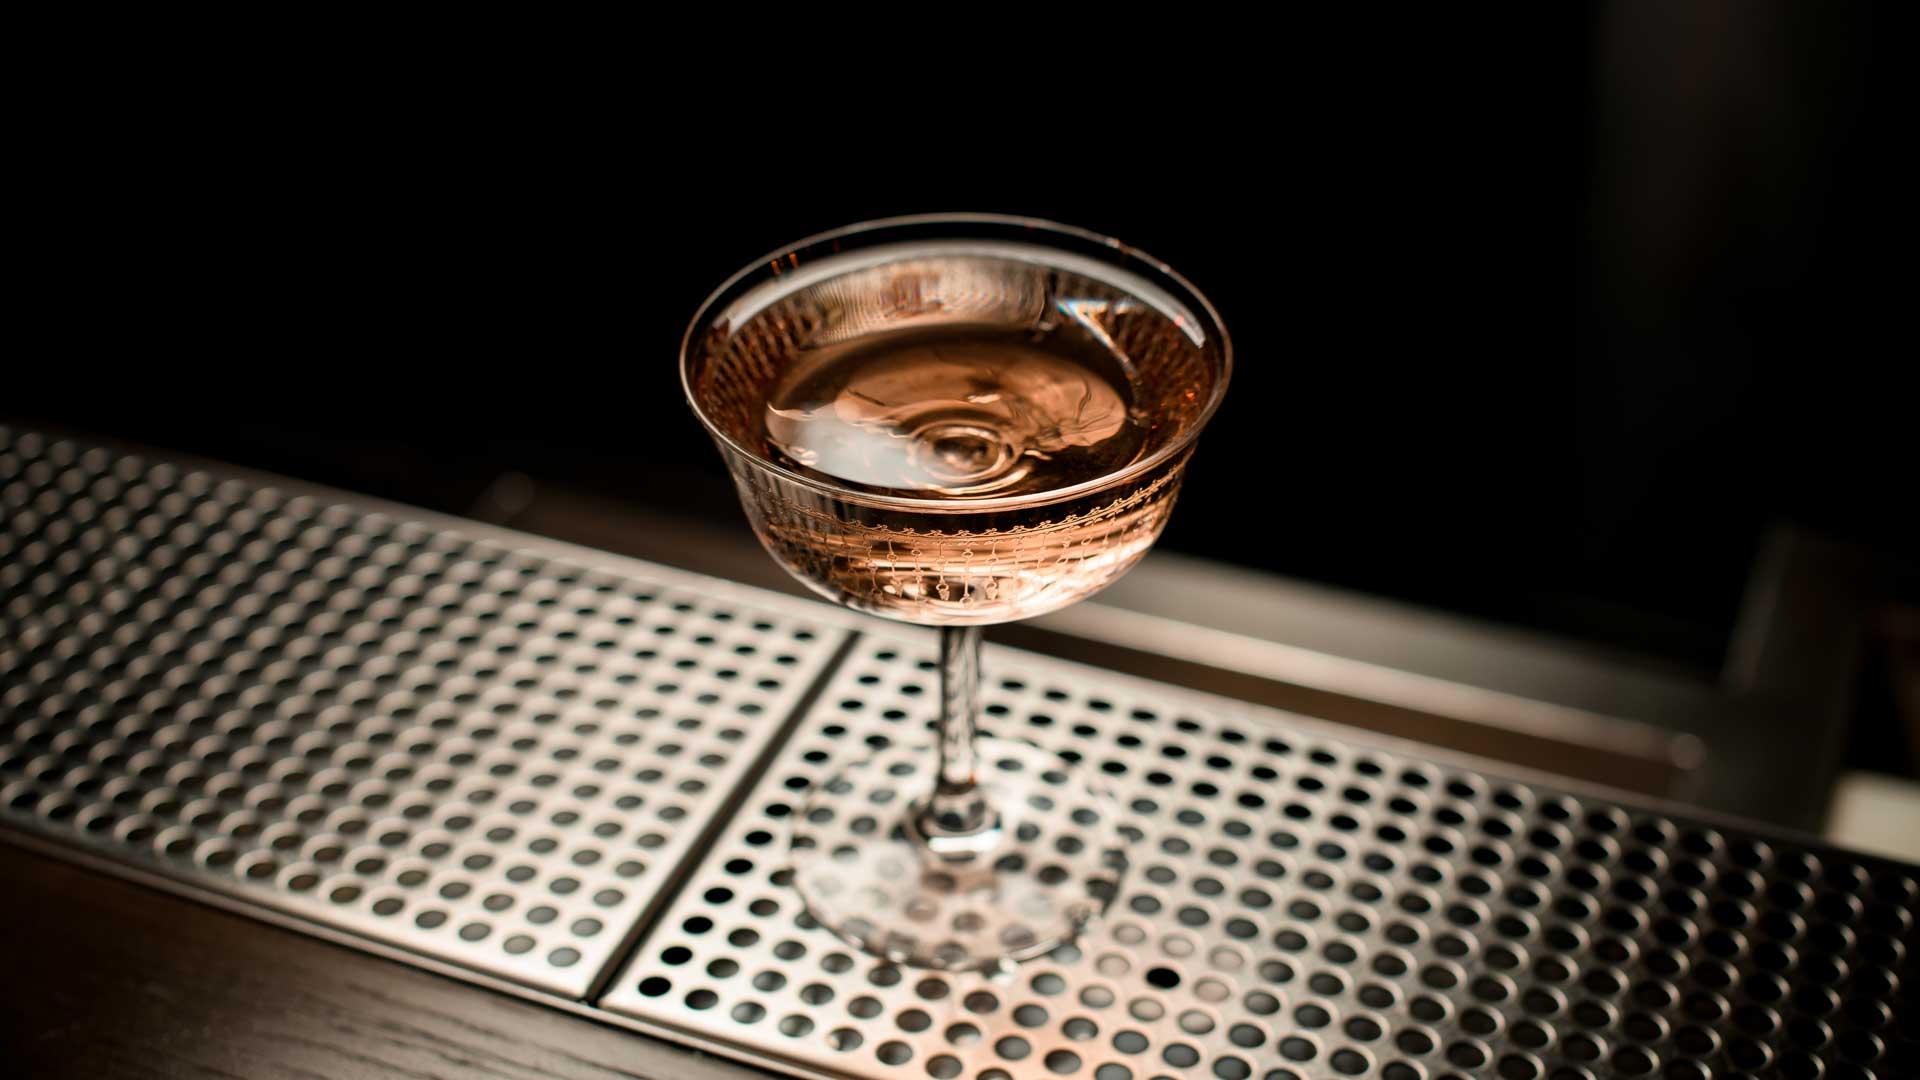 Adonis-cocktail-storia-ingredienti-ricetta-Coqtail-Milano